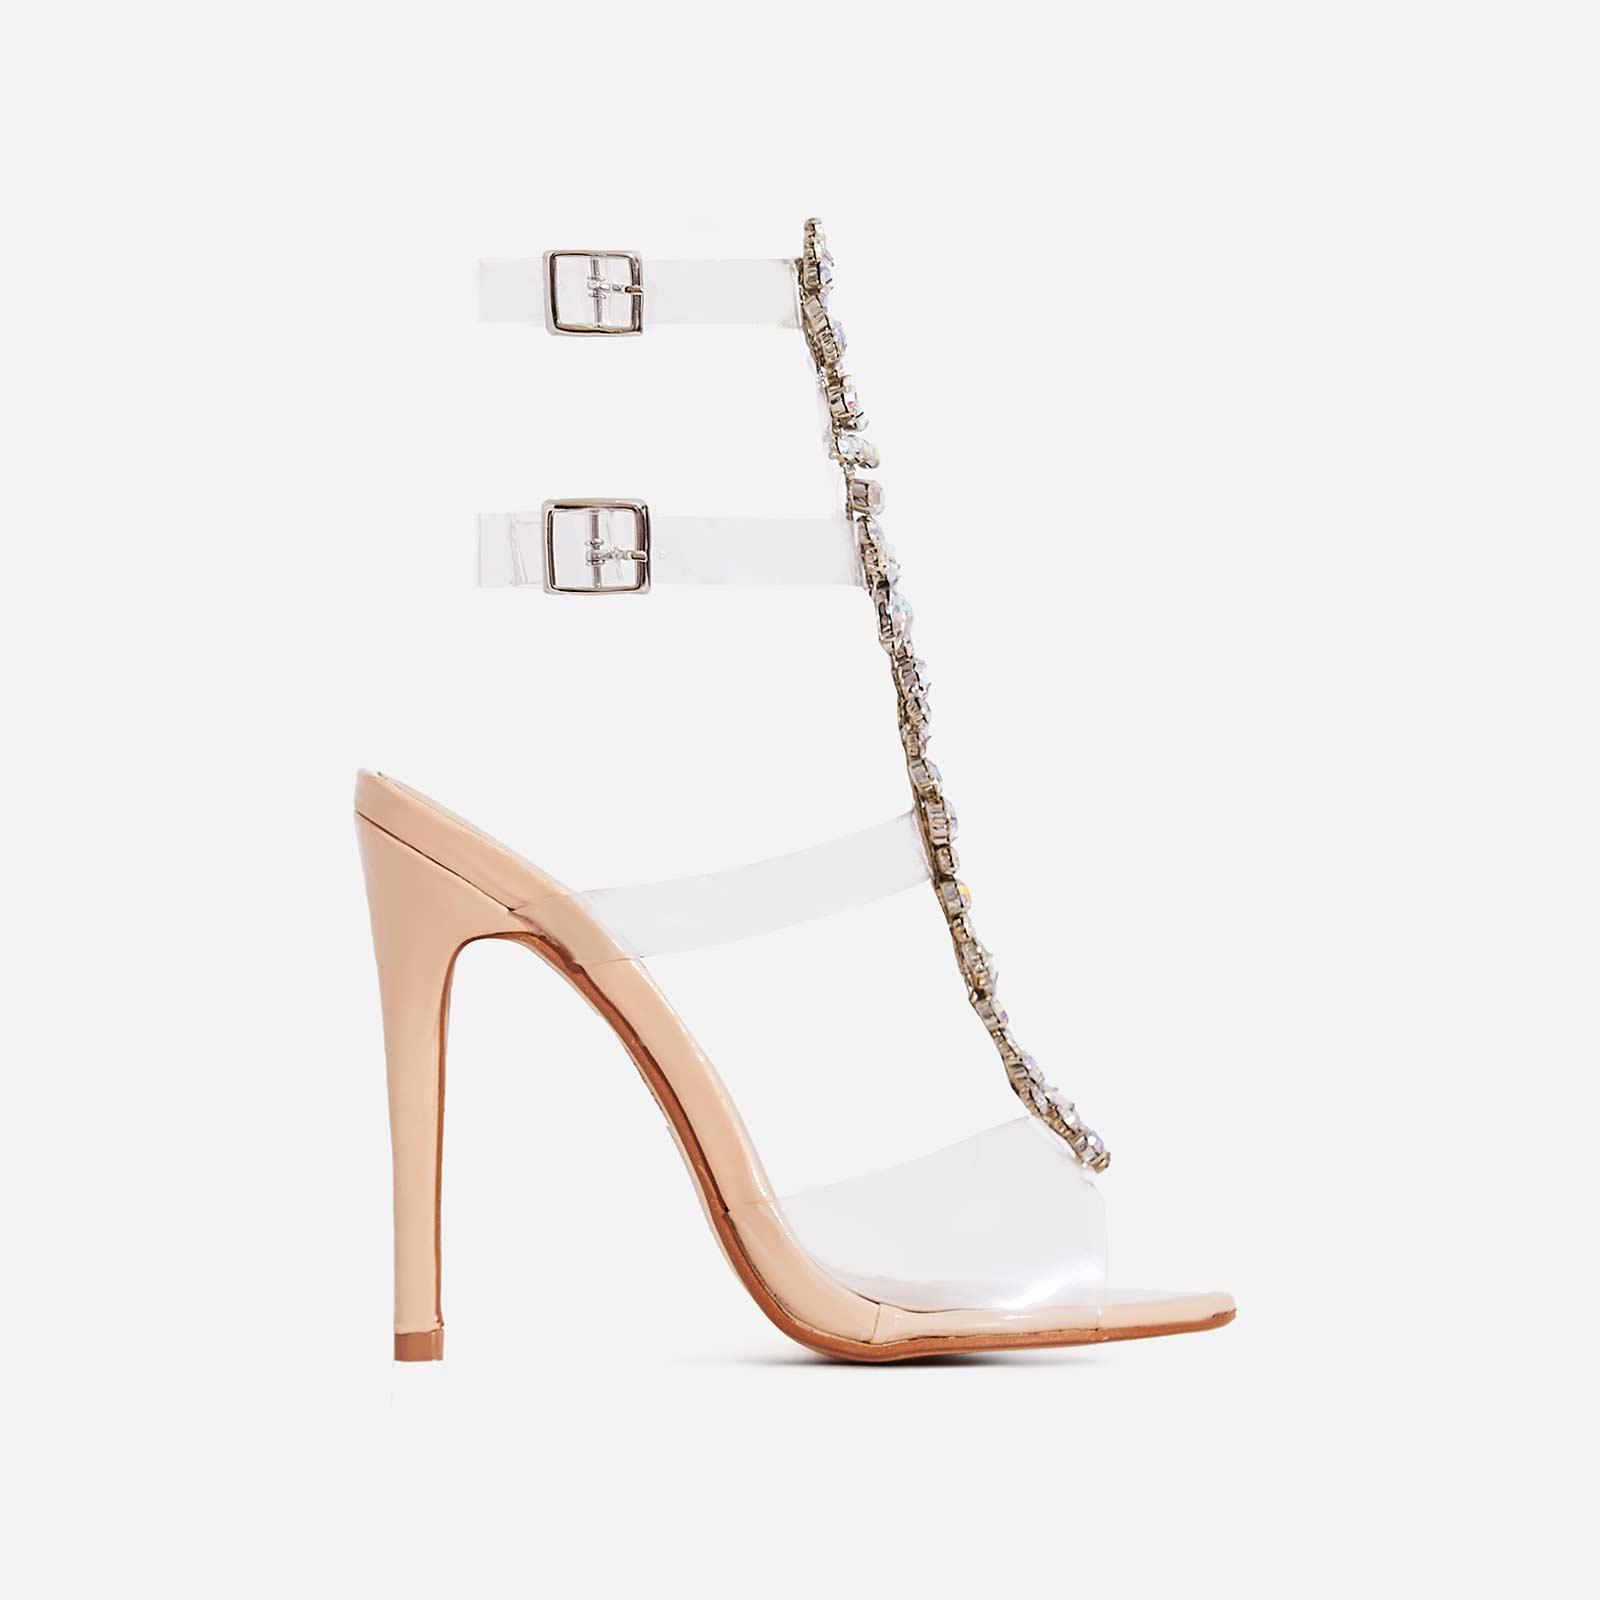 Belfonte Jewel Embellished Perspex Heel In Nude Patent